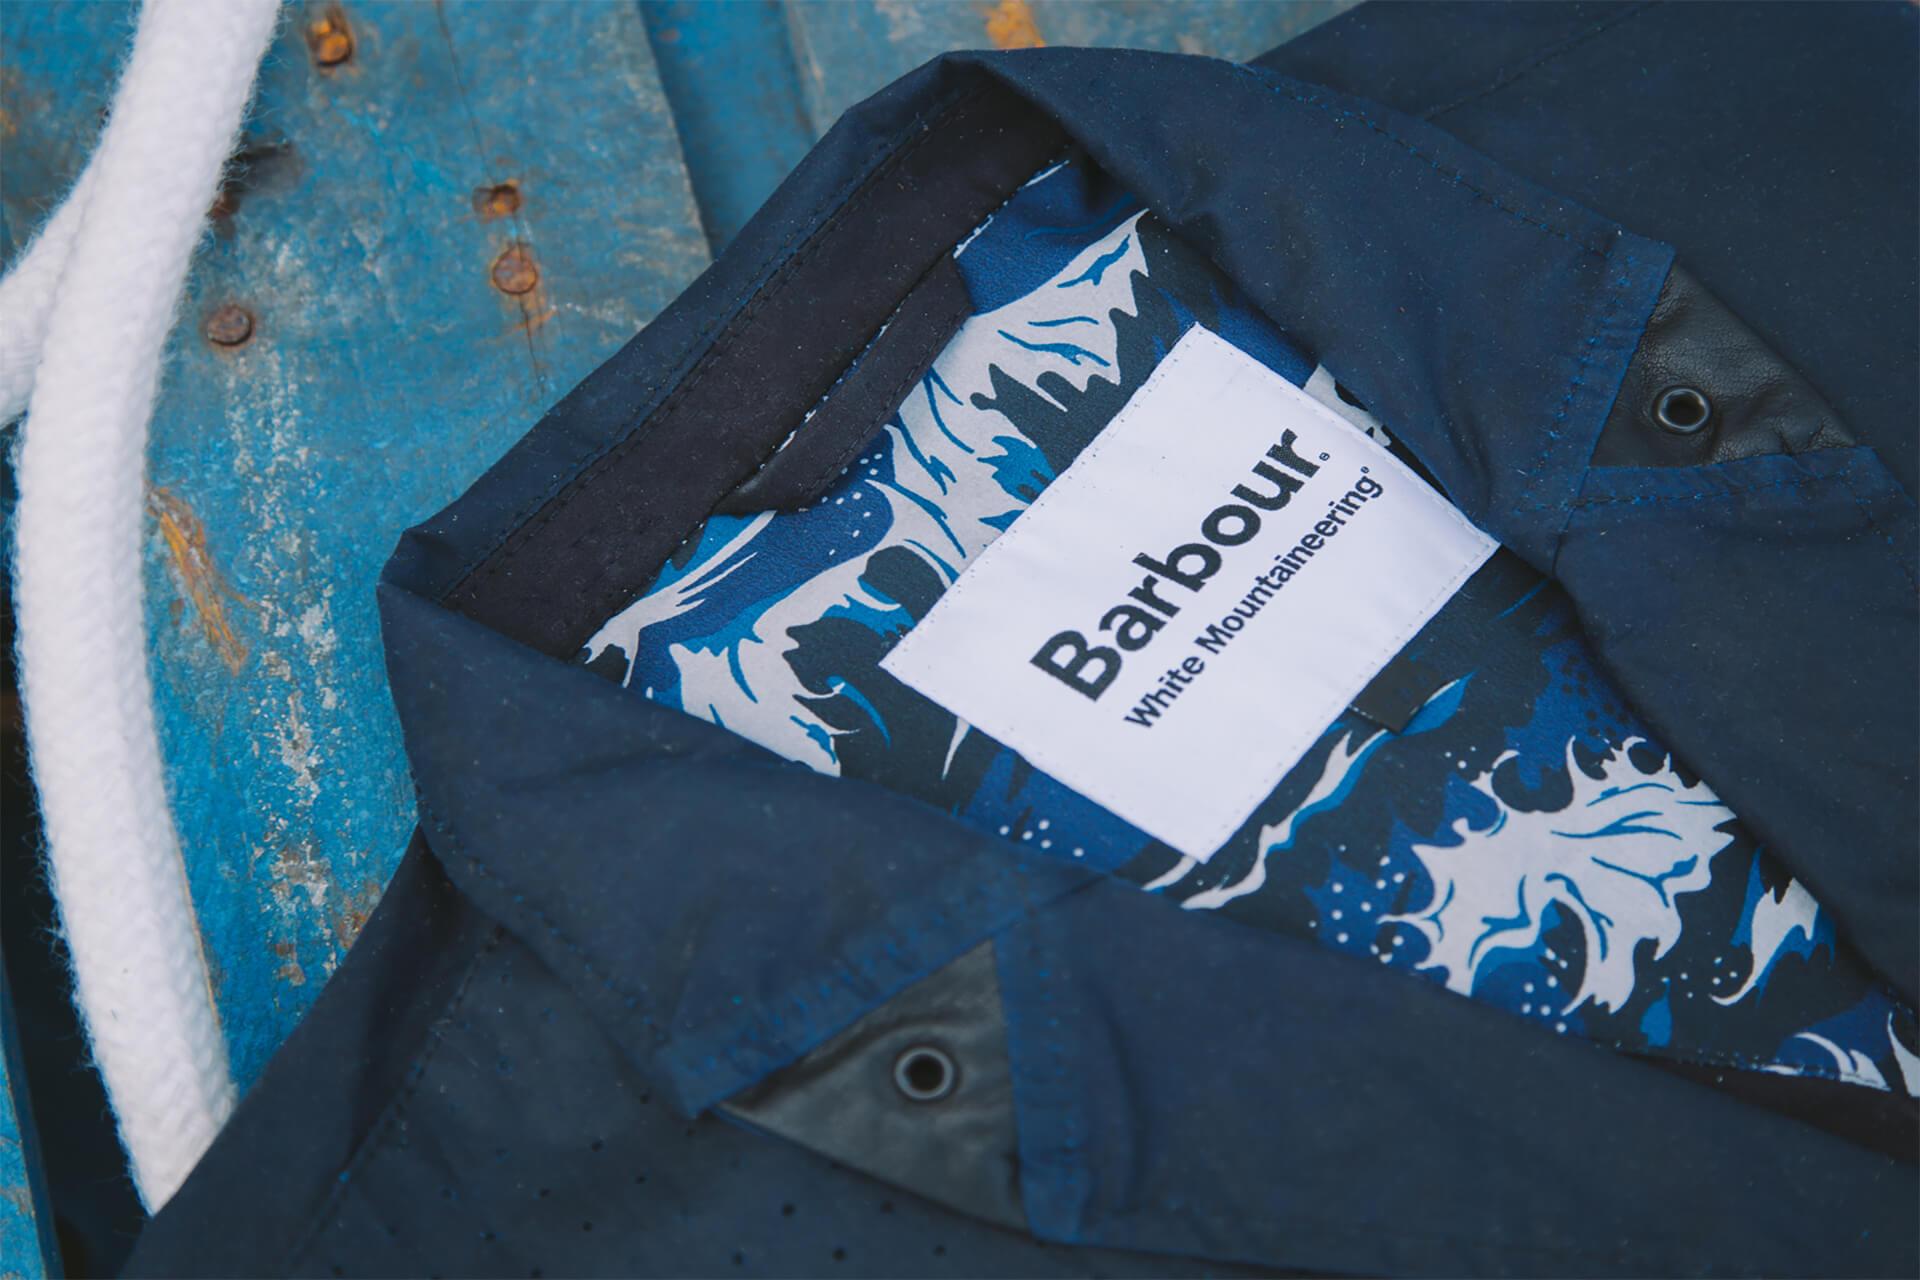 Barbour, White Mountaineering, British, Brand, Photography, Film, Agency, WeAreShuffle, Clothing, Shirts, Coat